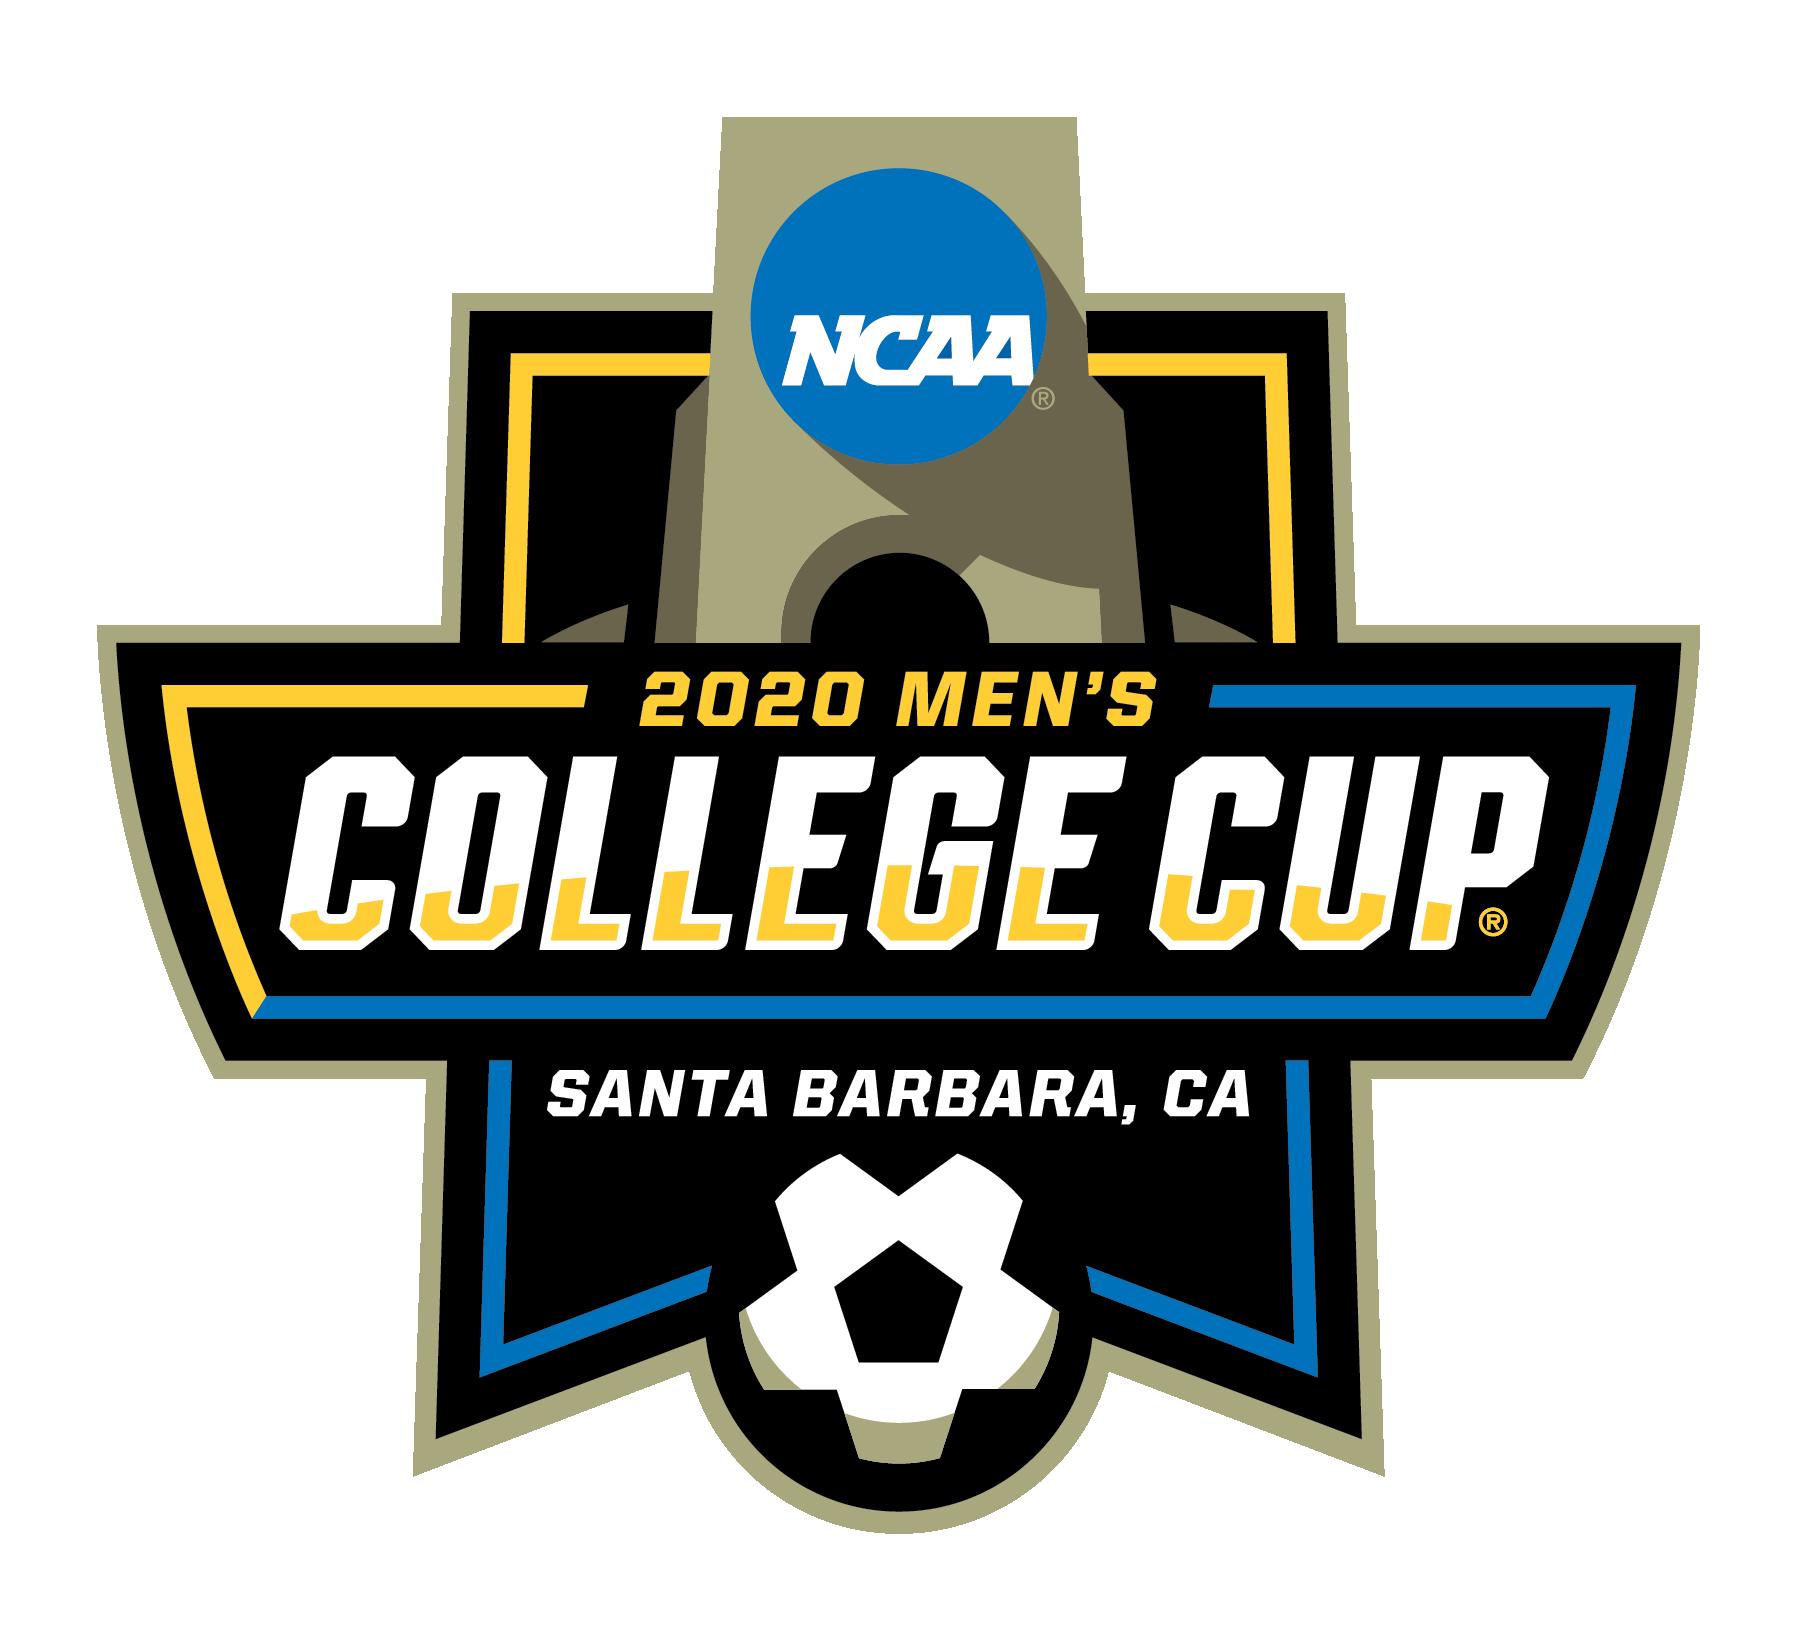 2020 Men's College Cup